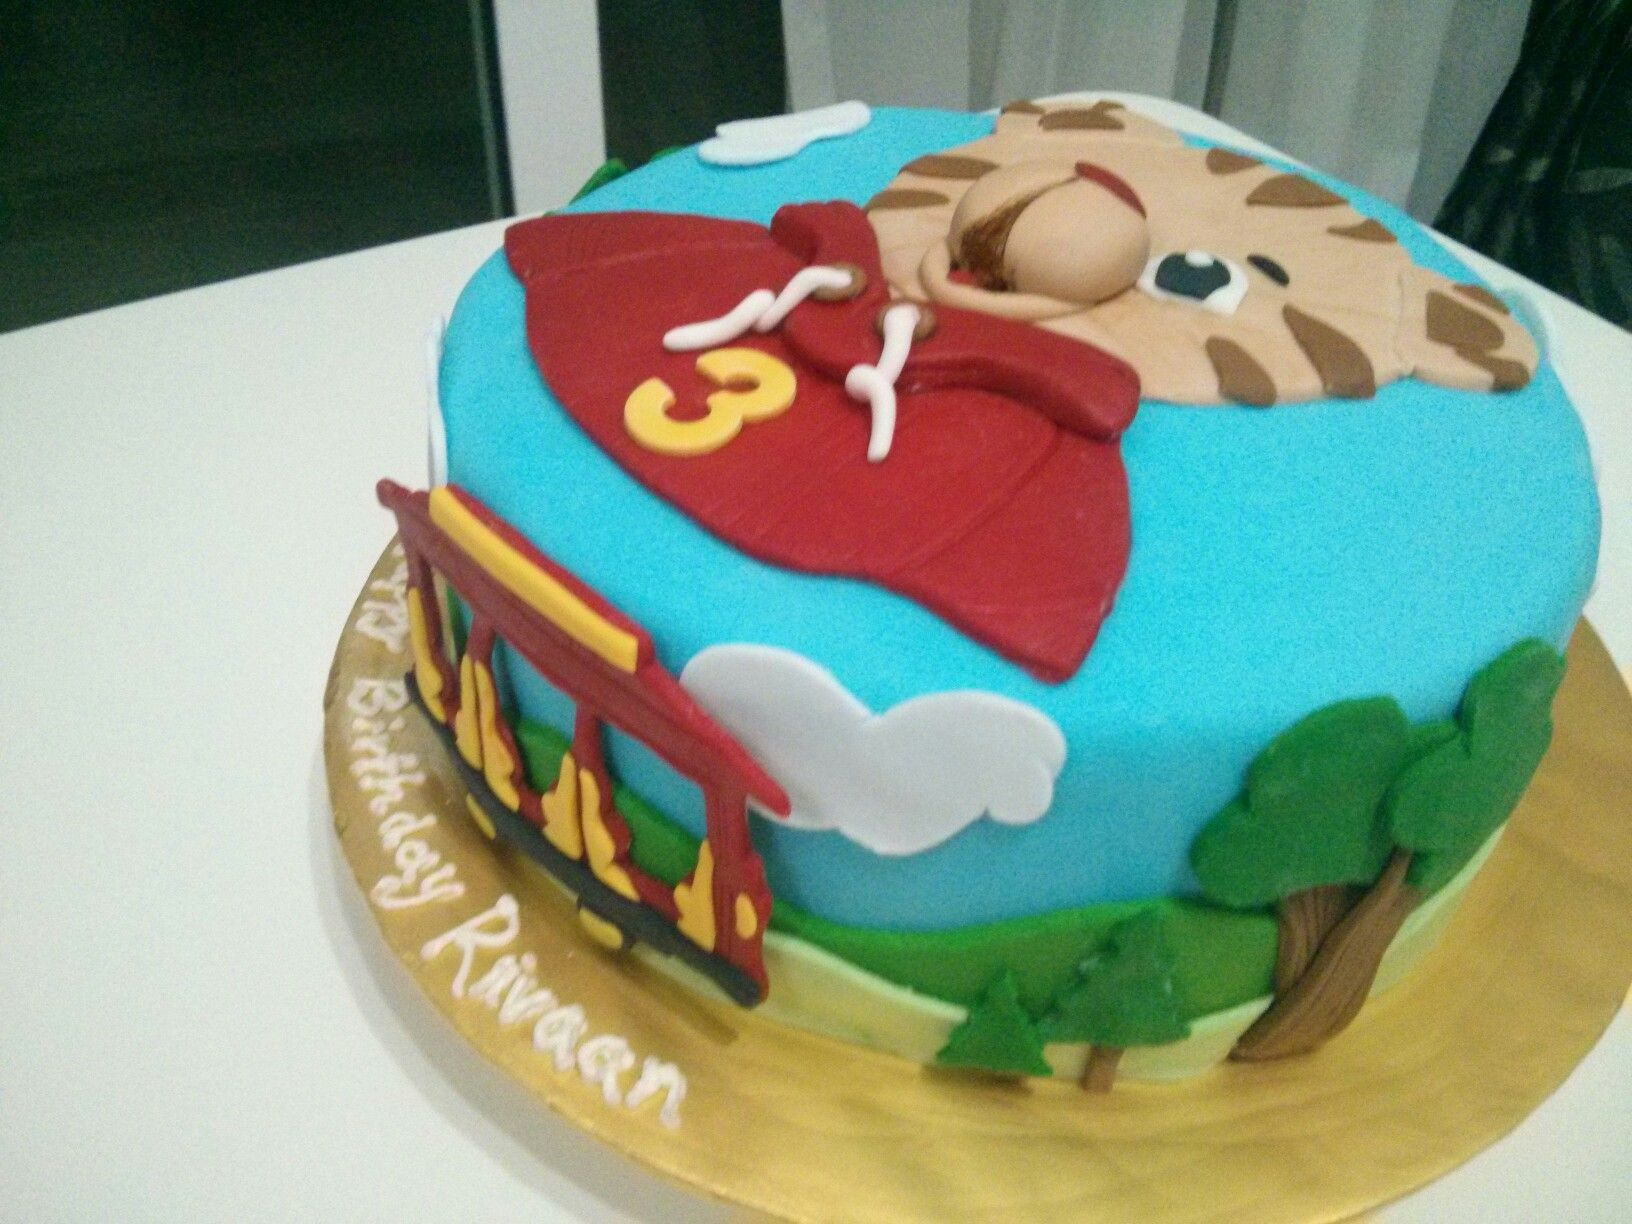 daniel the tiger cake cake designs pinterest tiger cake cake